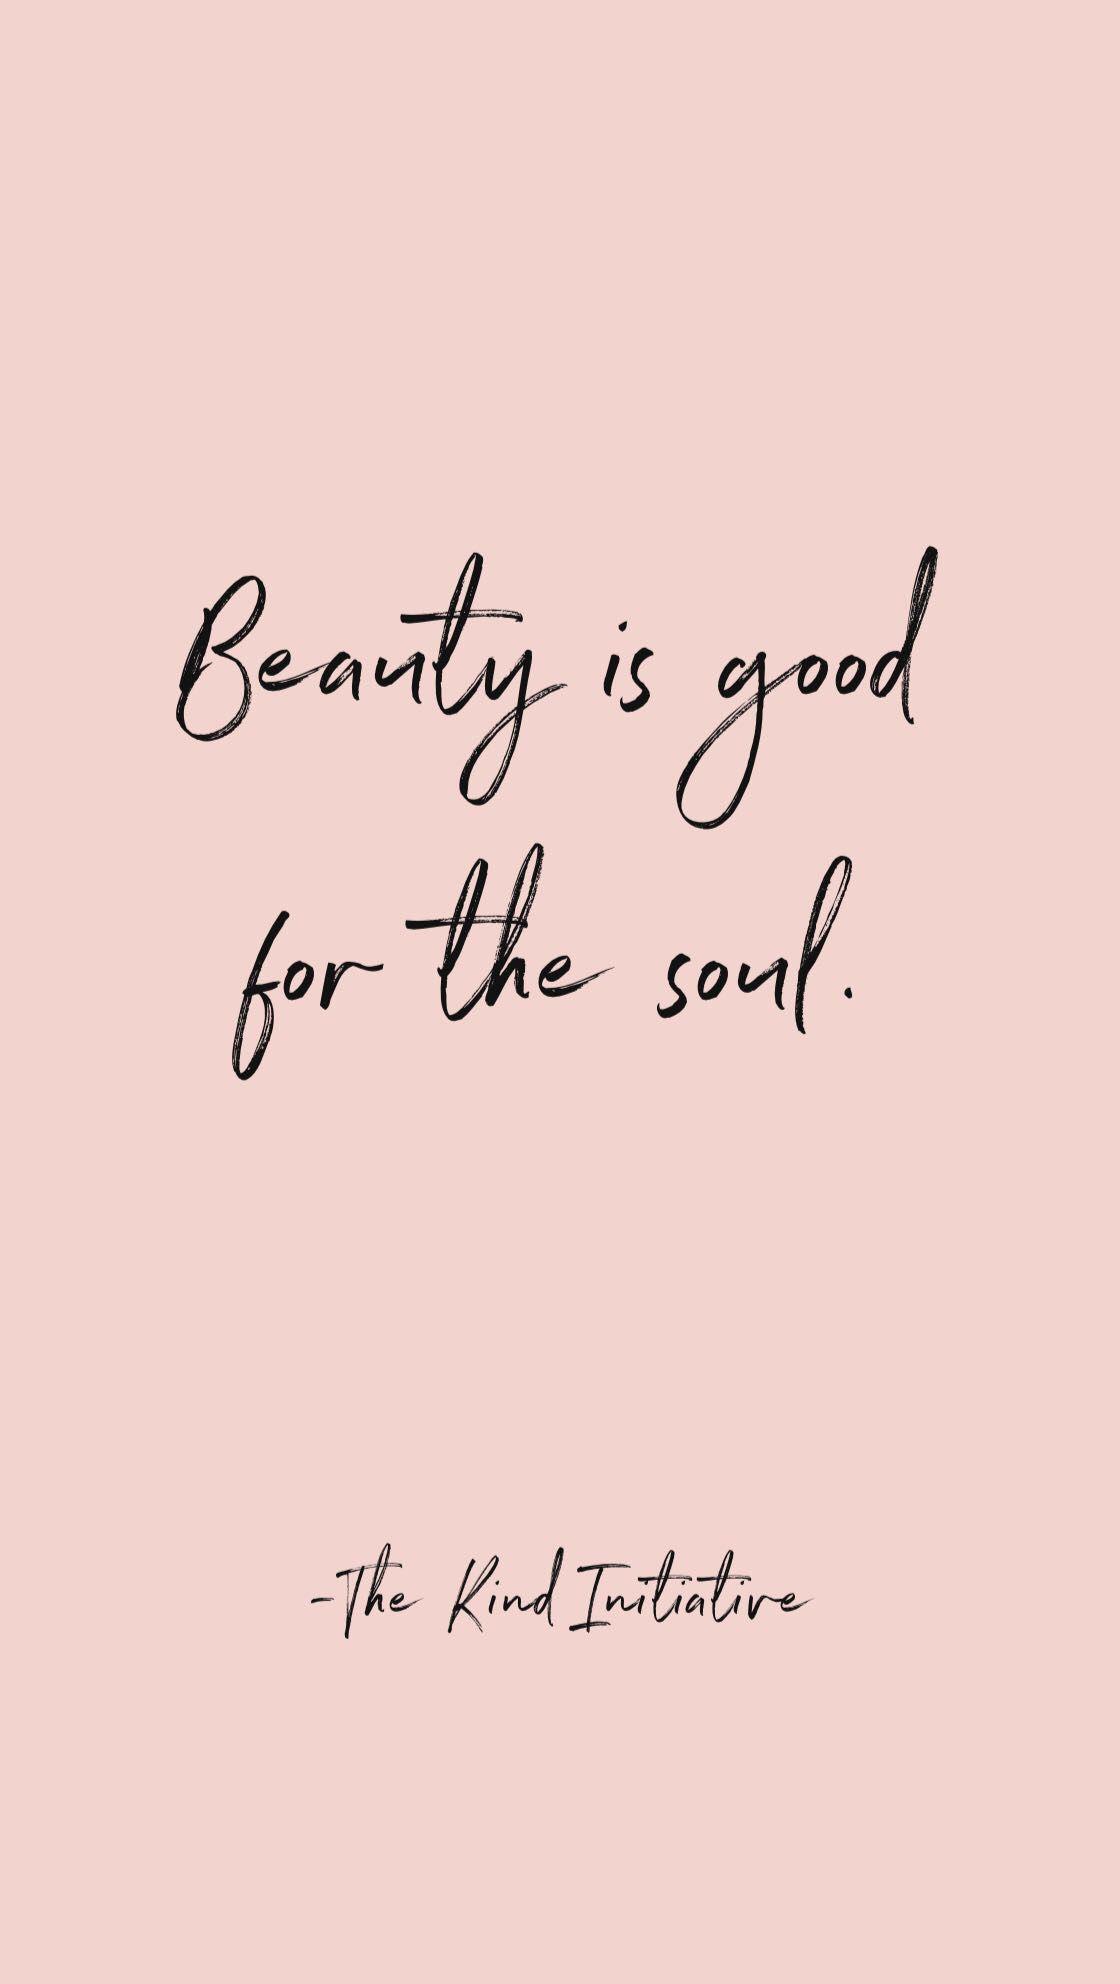 Inspirational Quotes -Inspirational Quotes- Self-Love-Motivation